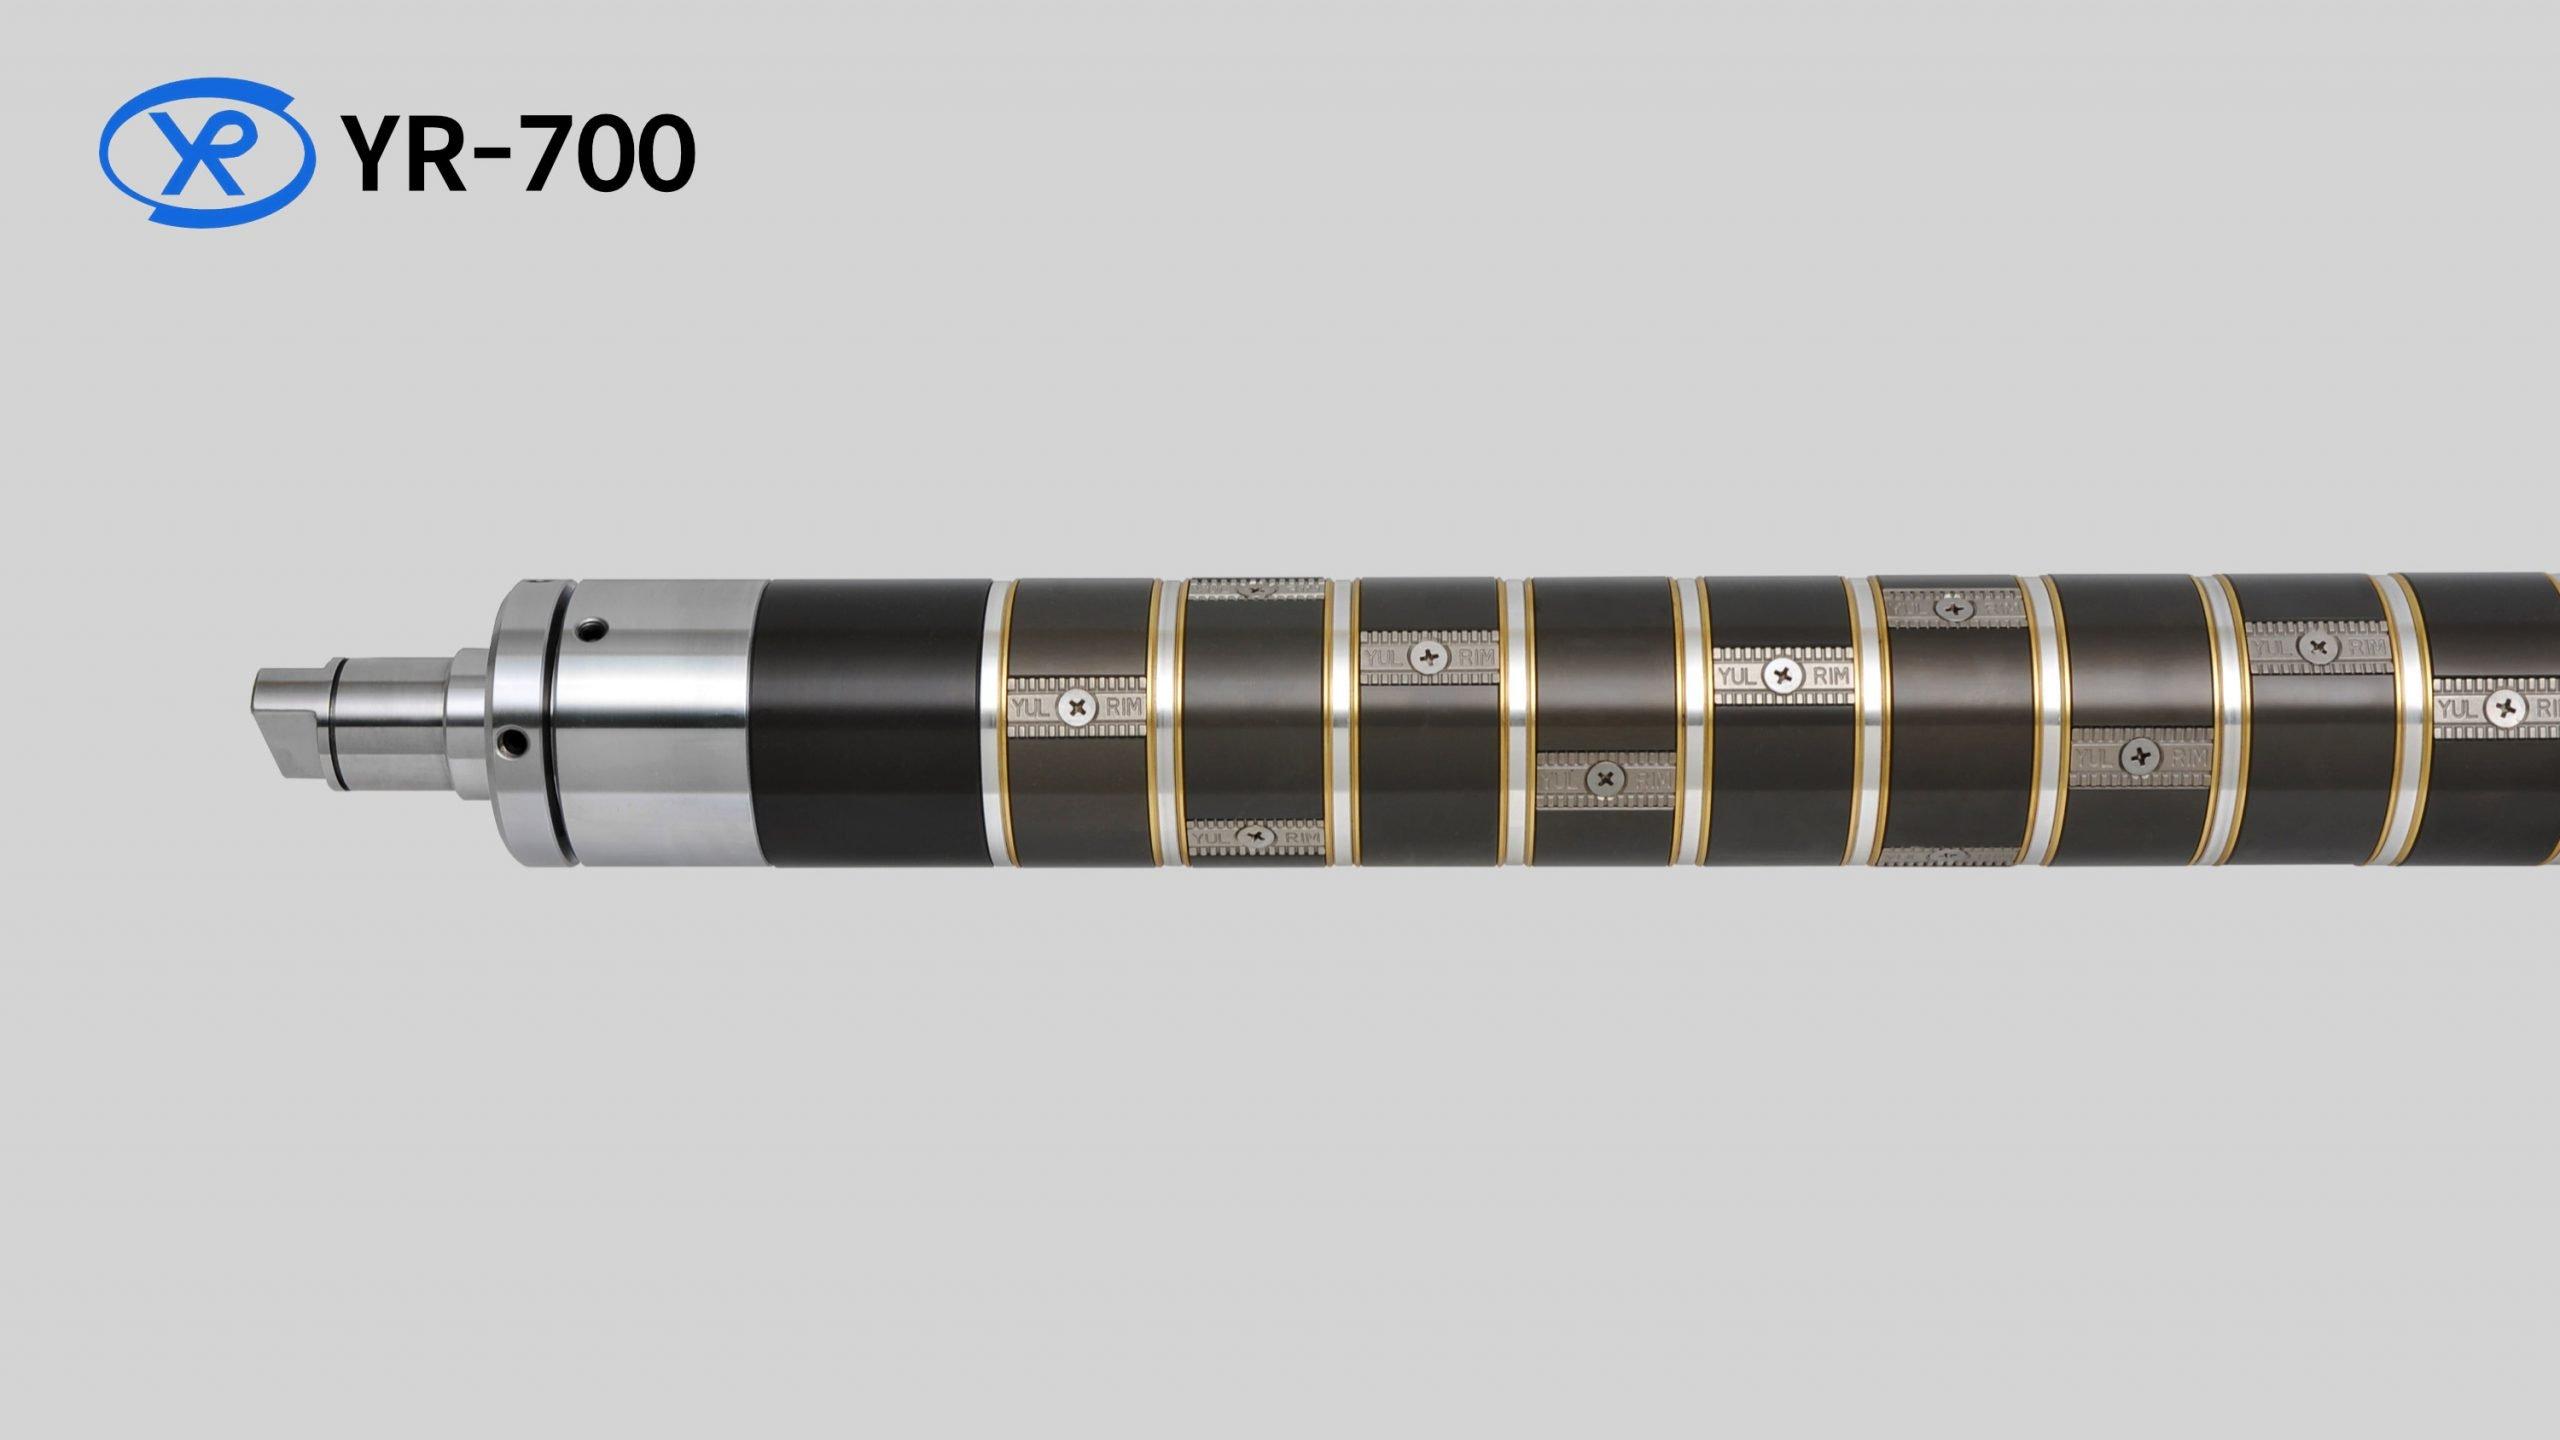 YR-700